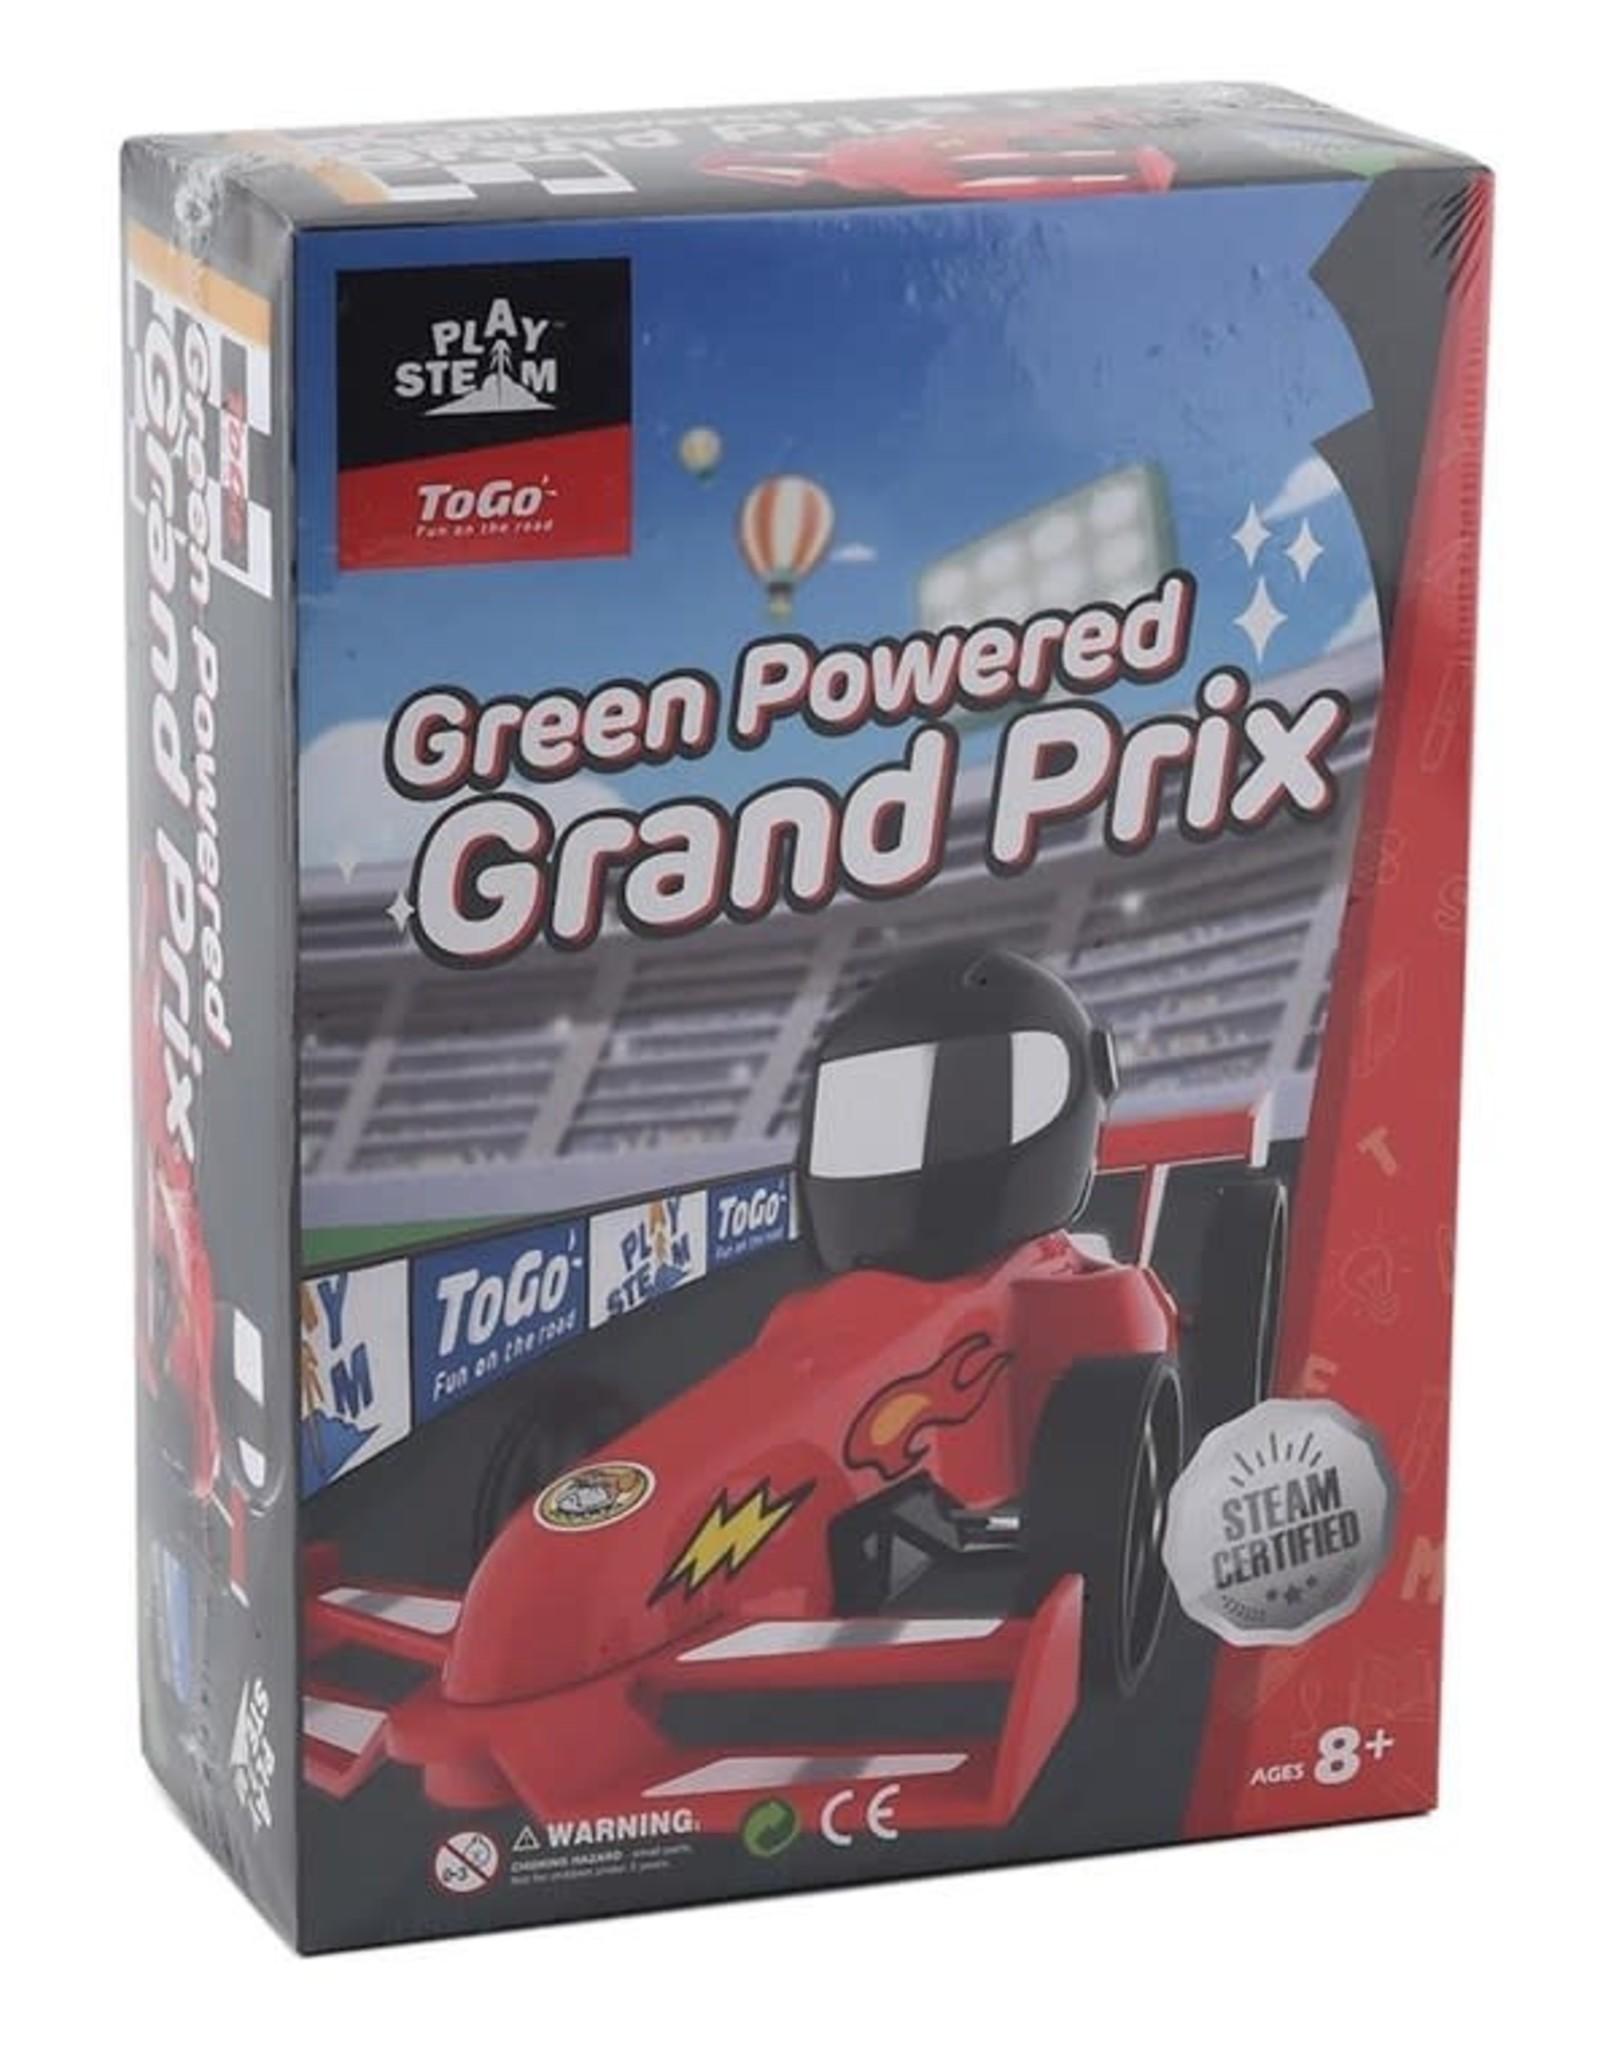 Green Powered Grand Prix